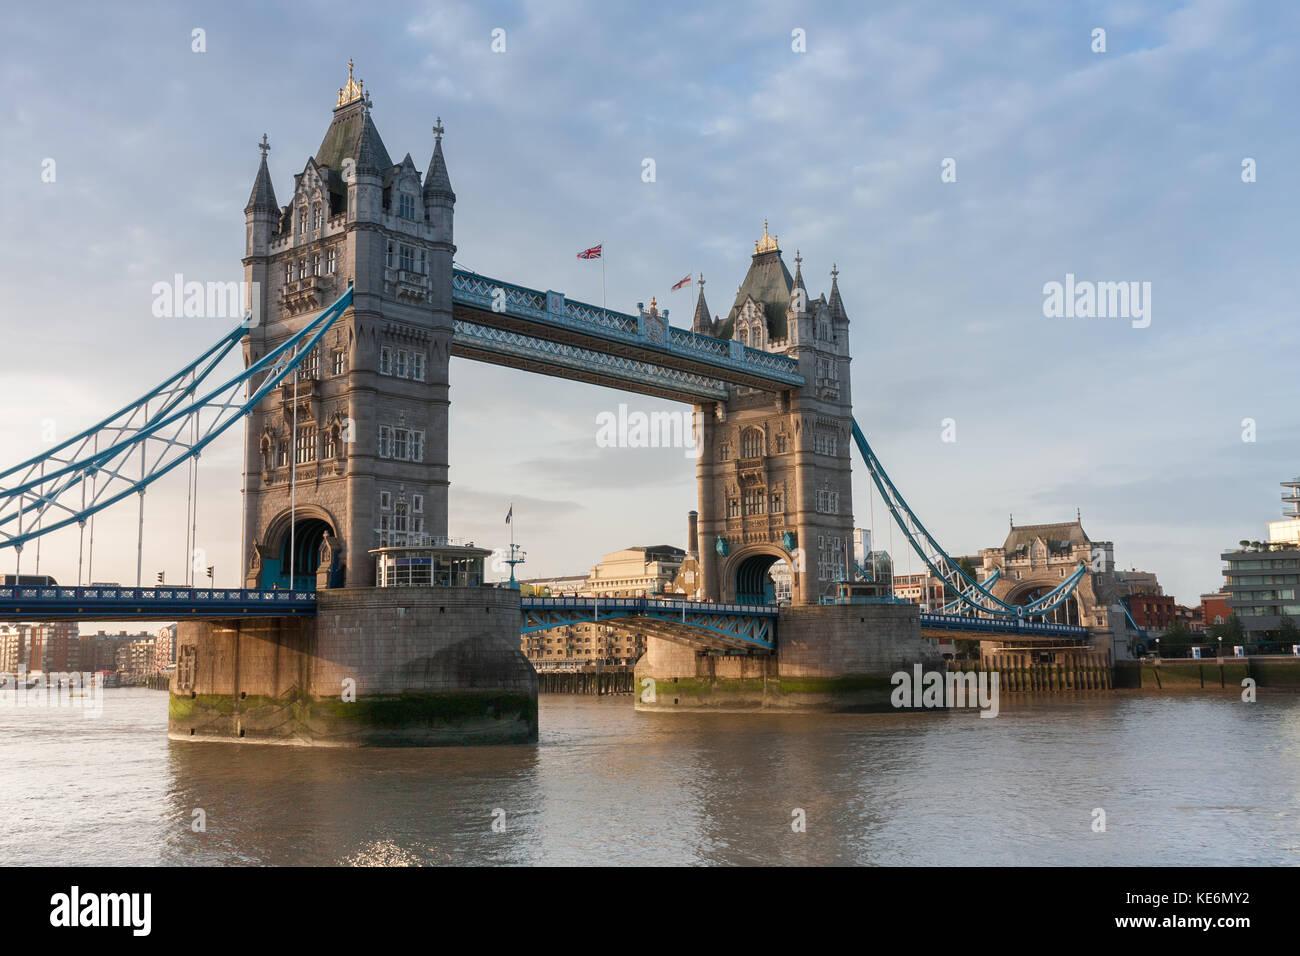 En la mañana del Tower Bridge, Londres, Inglaterra. Imagen De Stock